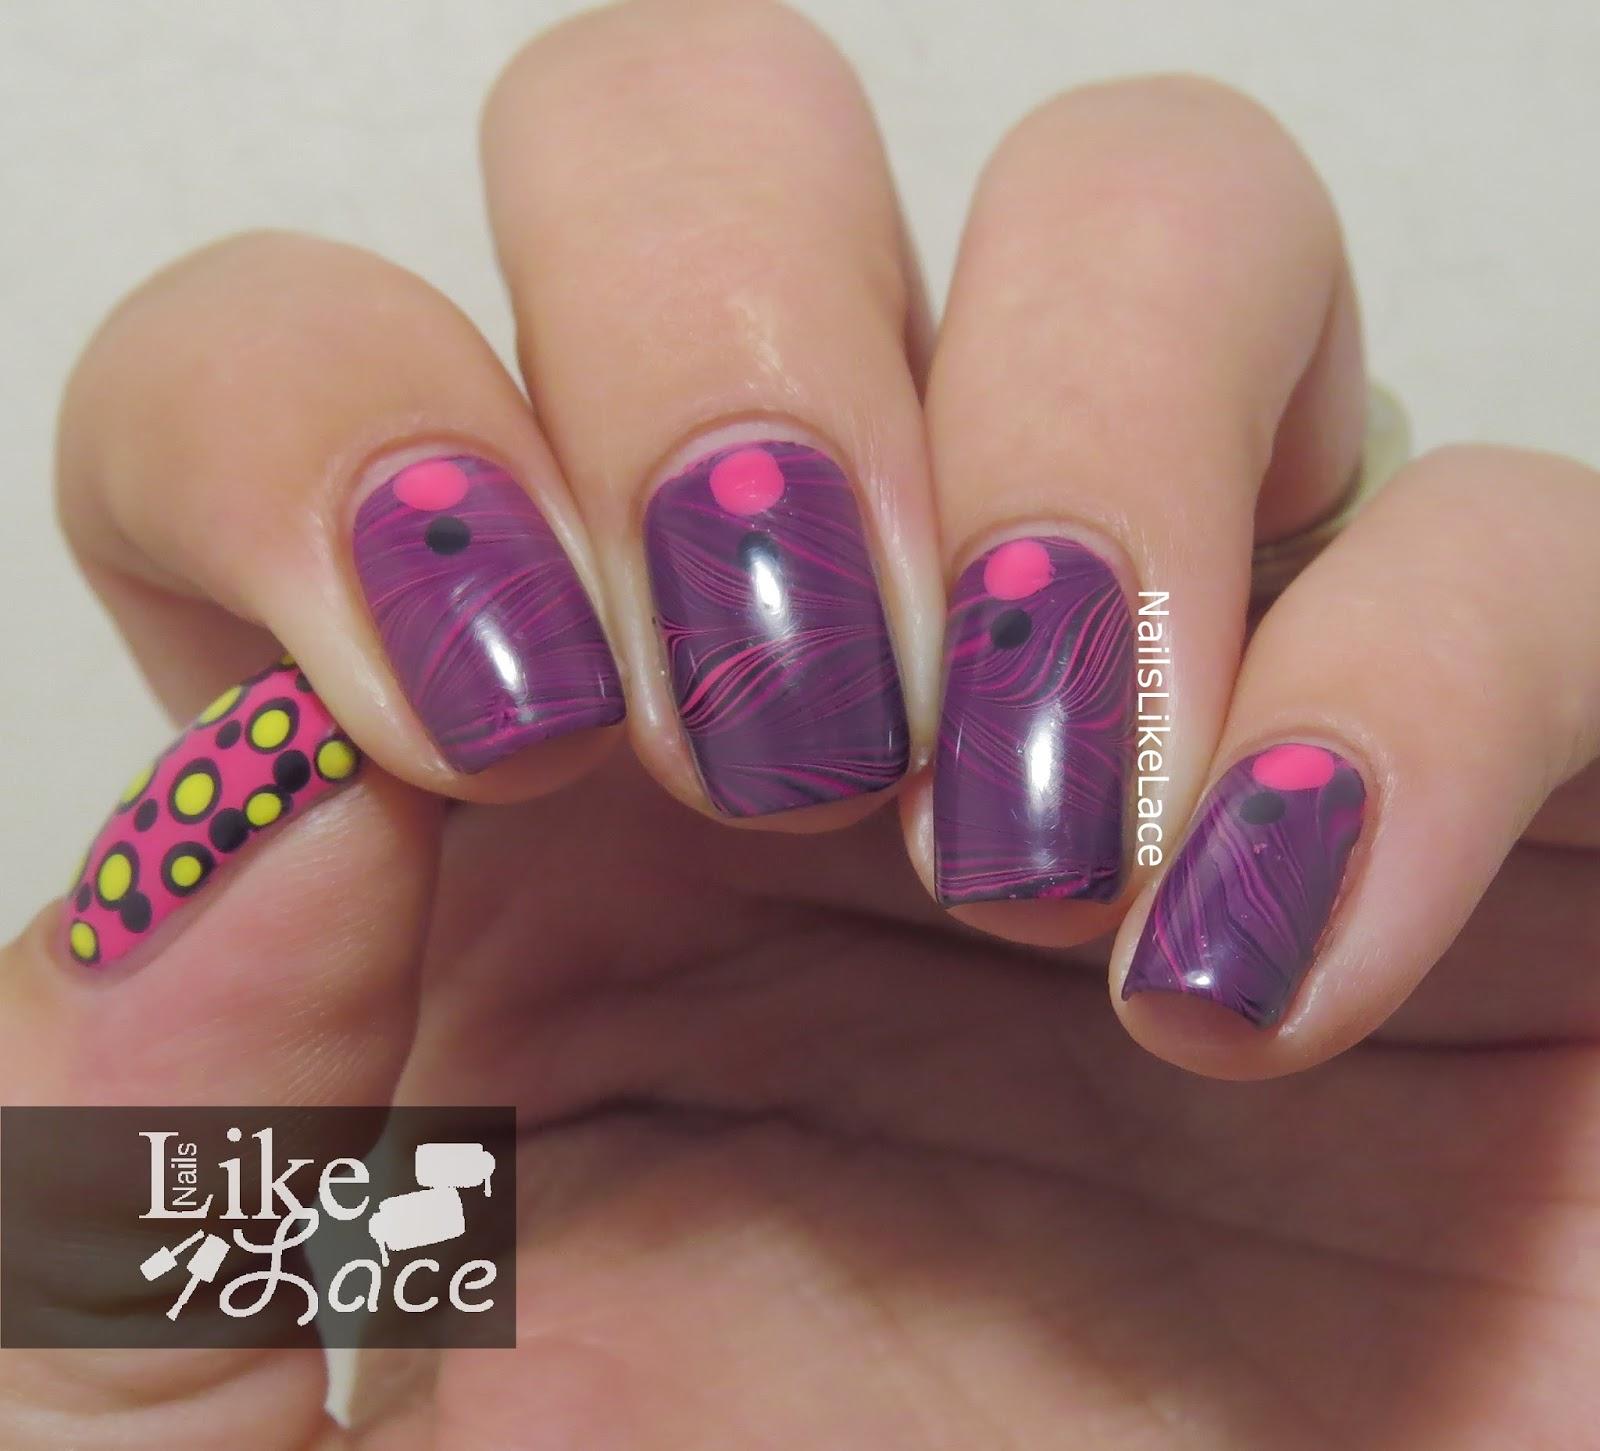 Tuesday Nail Polish: NailsLikeLace: Twinsie Tuesday